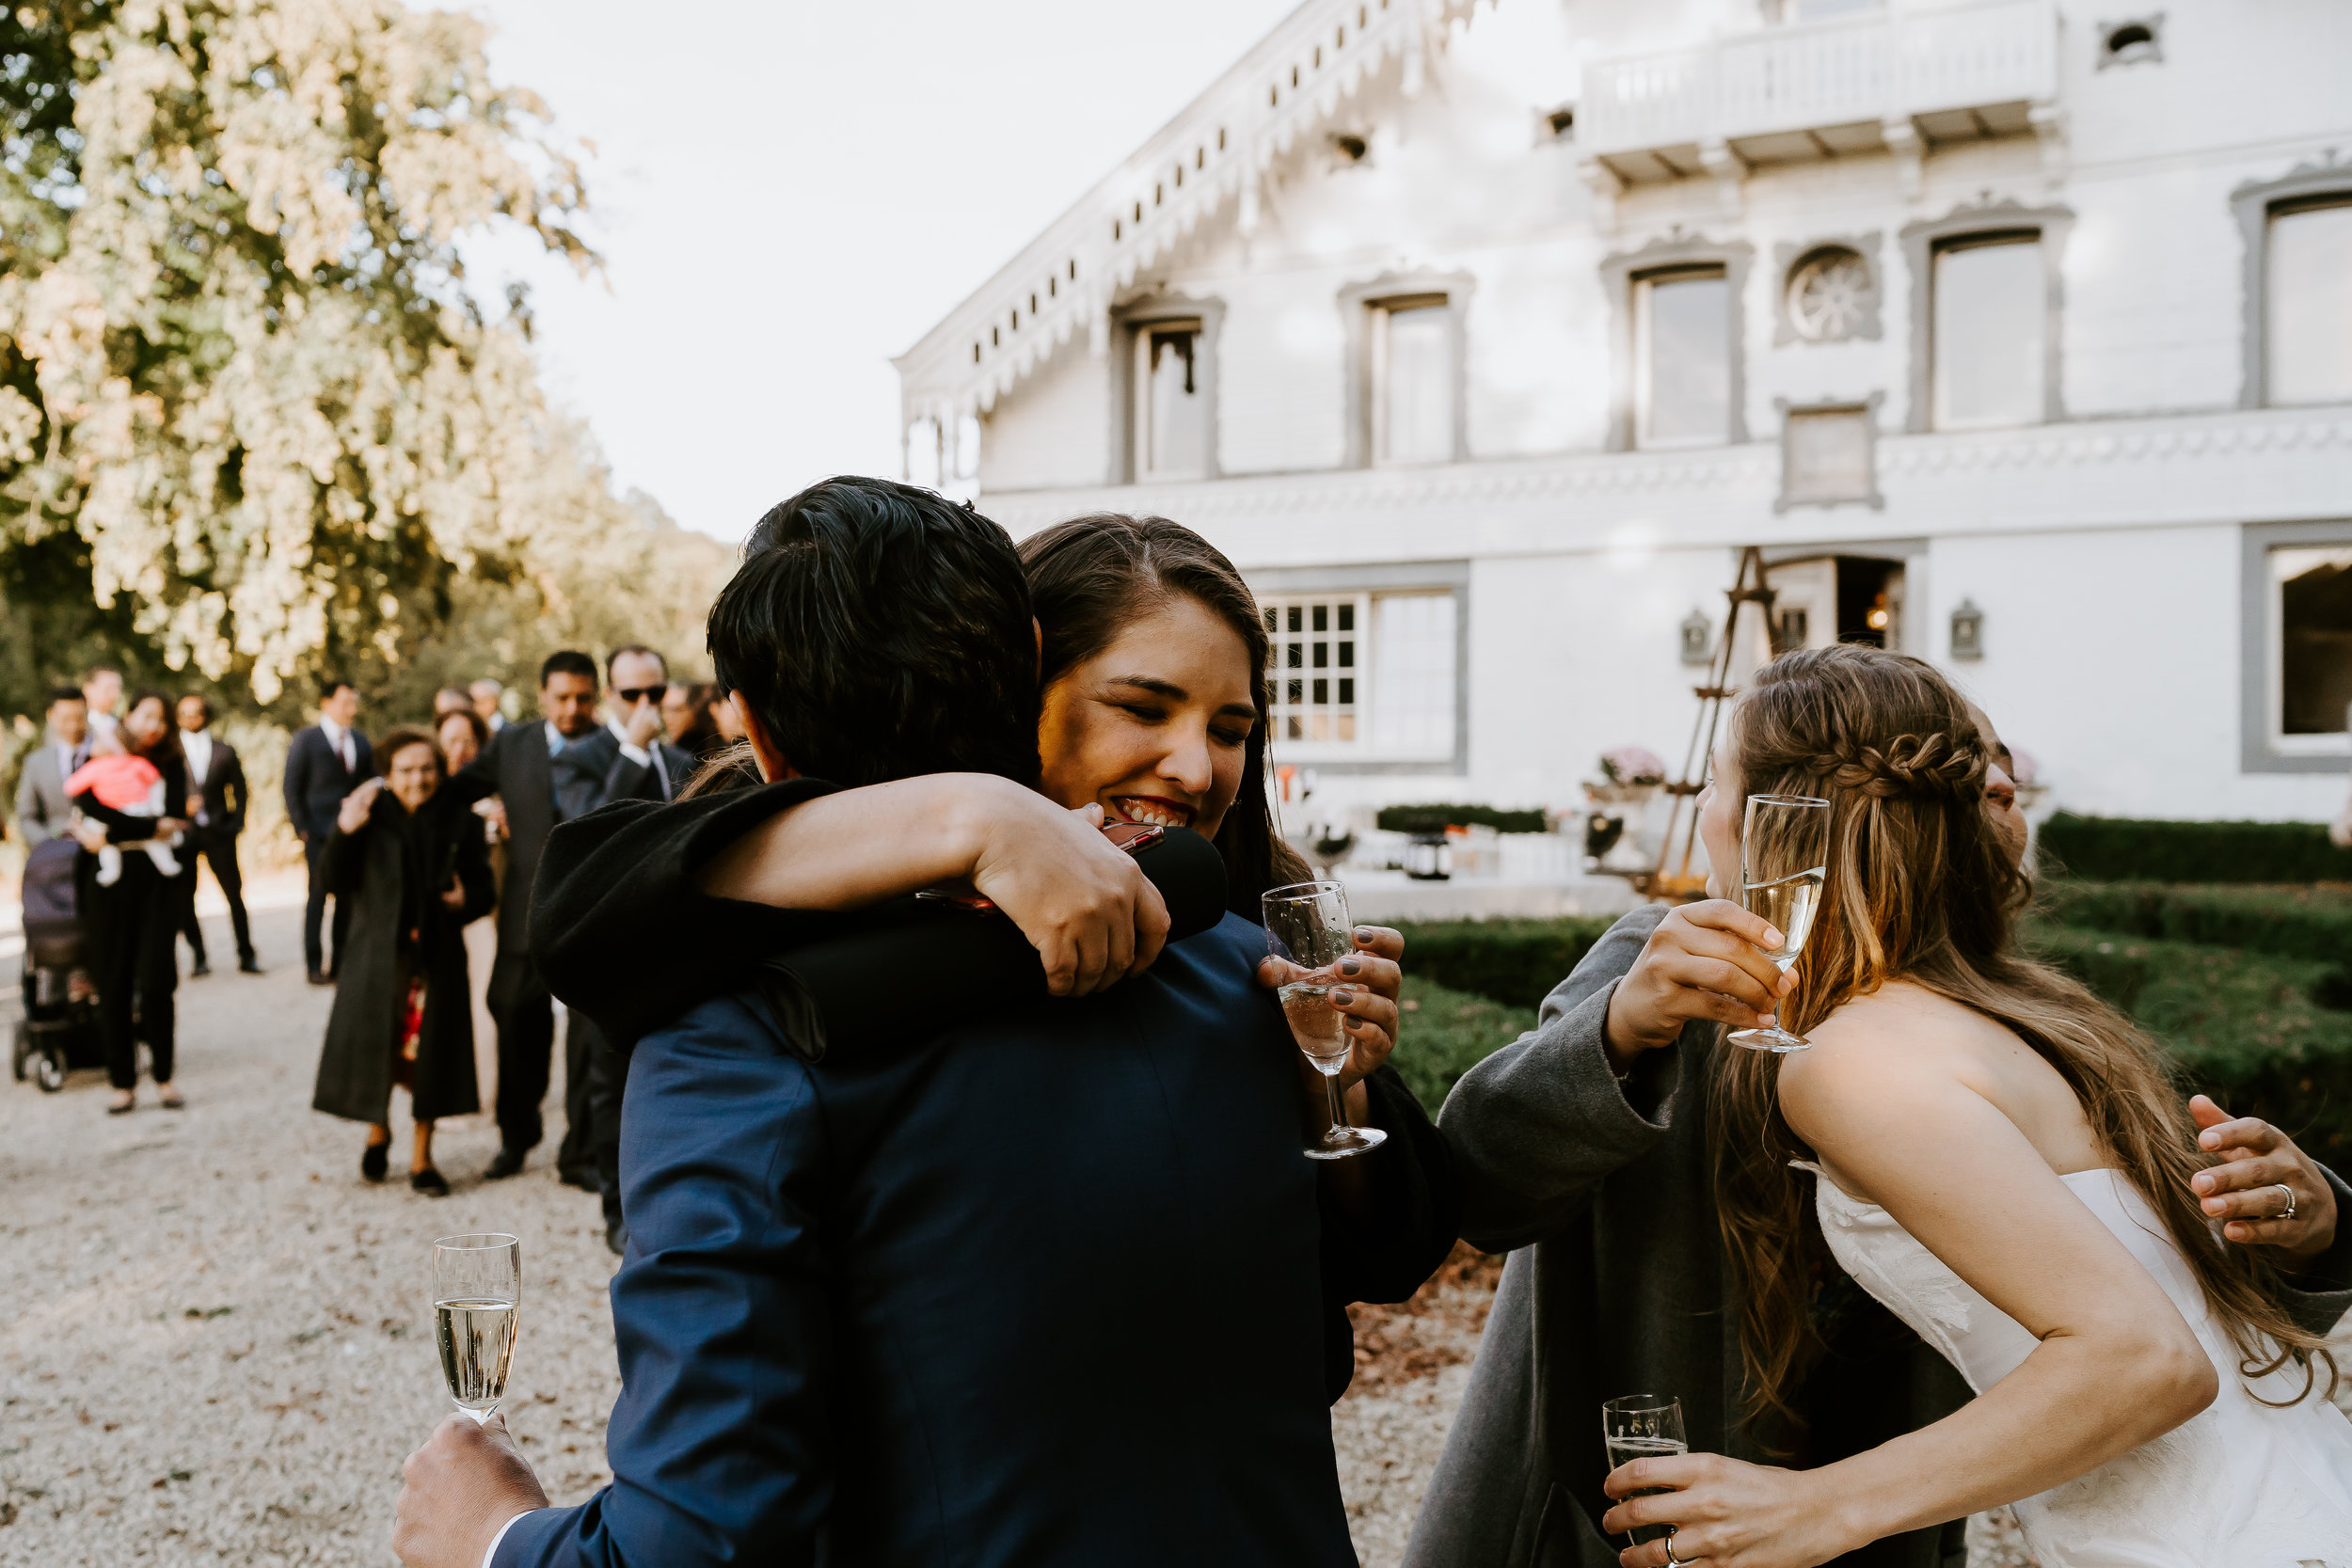 bruiloft-altembrouck-overthemoonweddings46.jpg